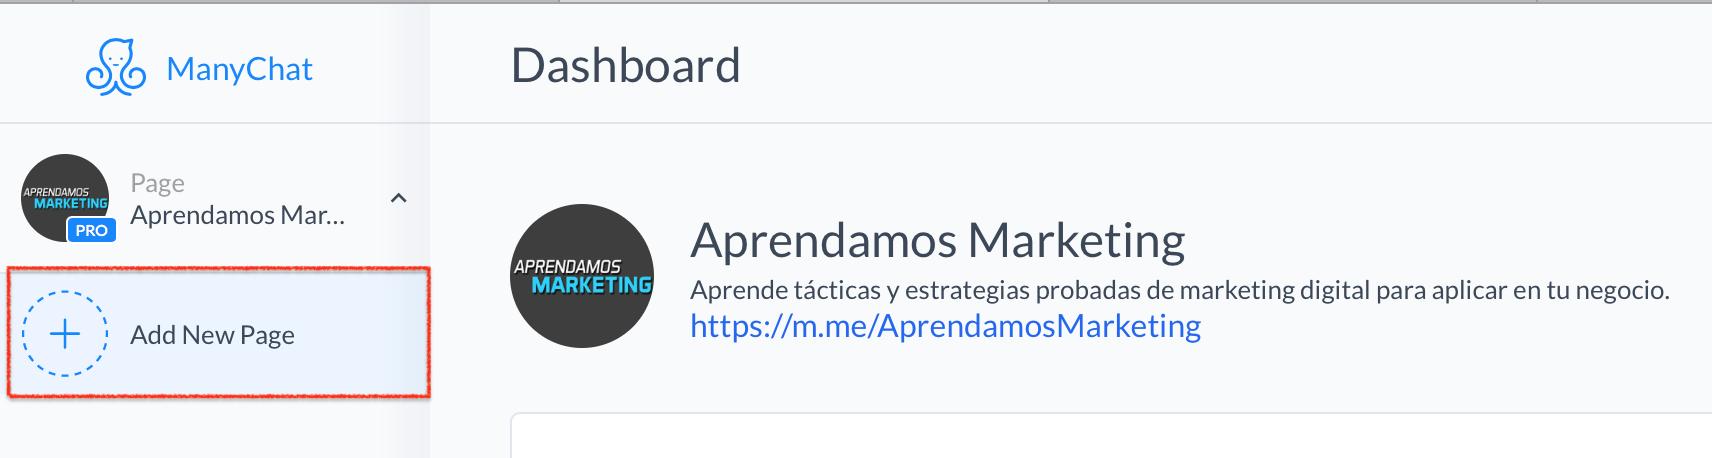 crear mensajes automatizados en Messenger - conectar fanpage